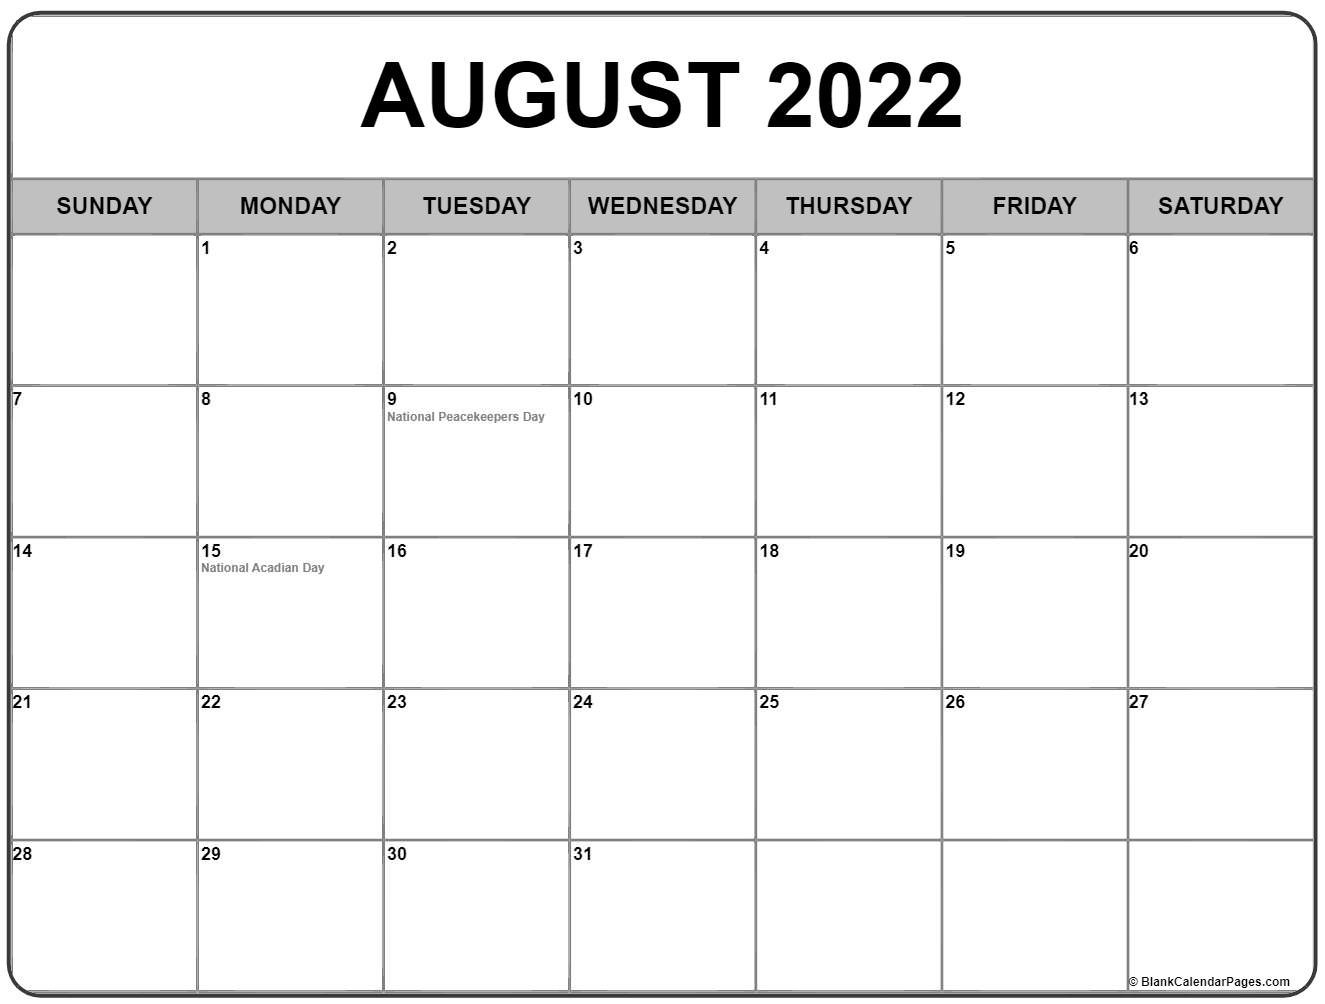 August 2022 Calendar With Holidays pertaining to Printable 2022 August Calendar